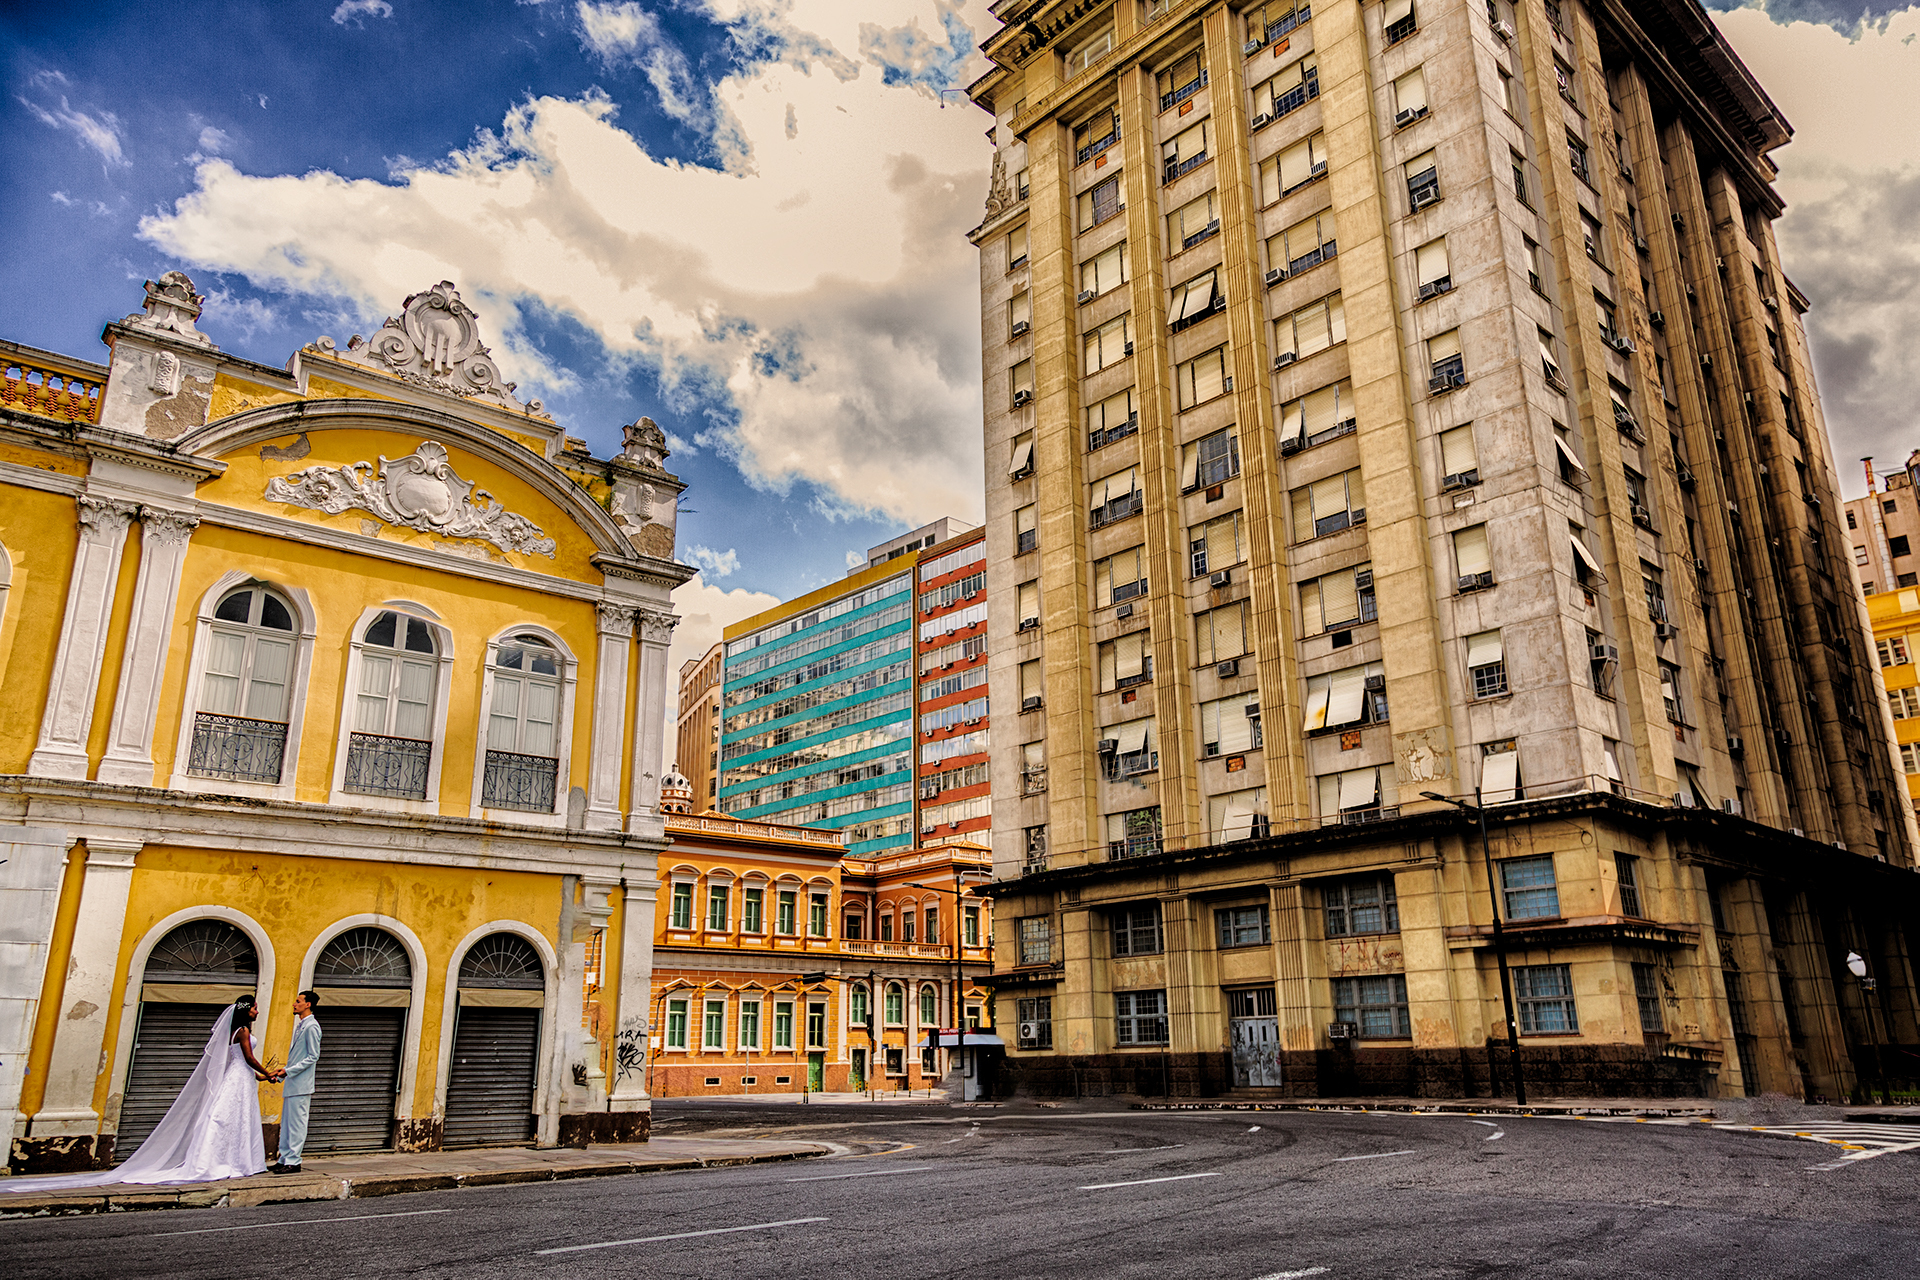 Contate Fotografo de Casamento - RS Rogerio Frota - Porto Alegre - RS